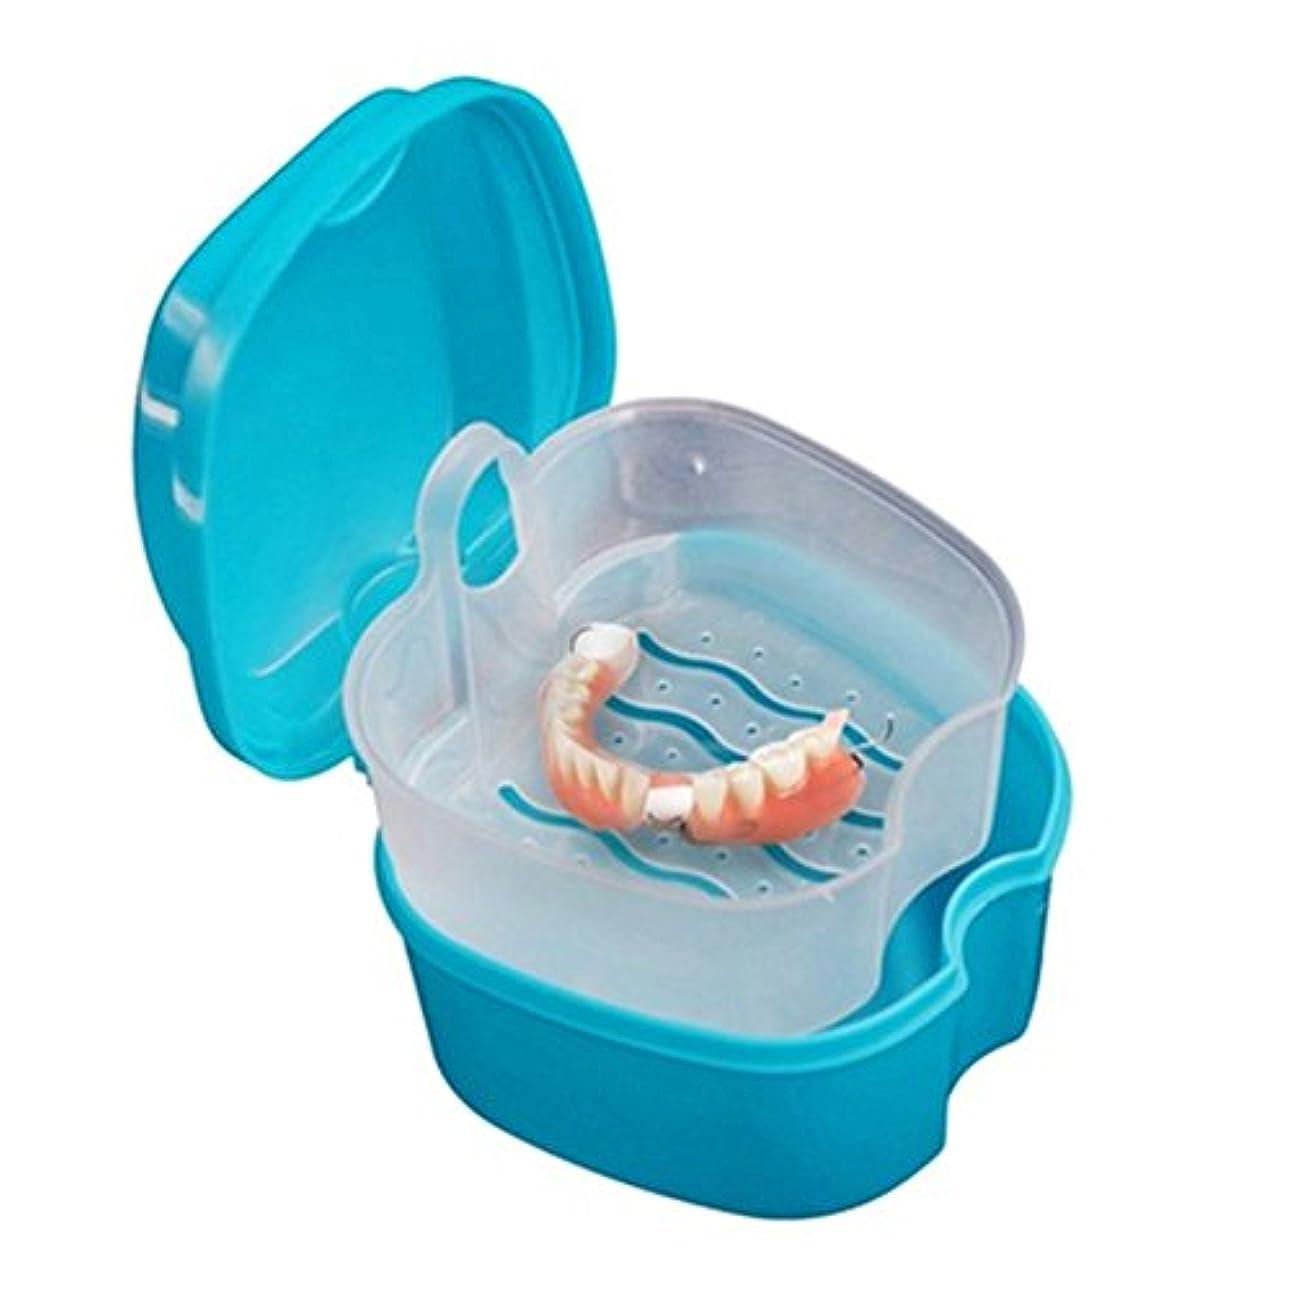 Cozyrom ネット付き 抗菌加工 乳歯 入れ歯収納ケース 容器 ボック 使いやすい